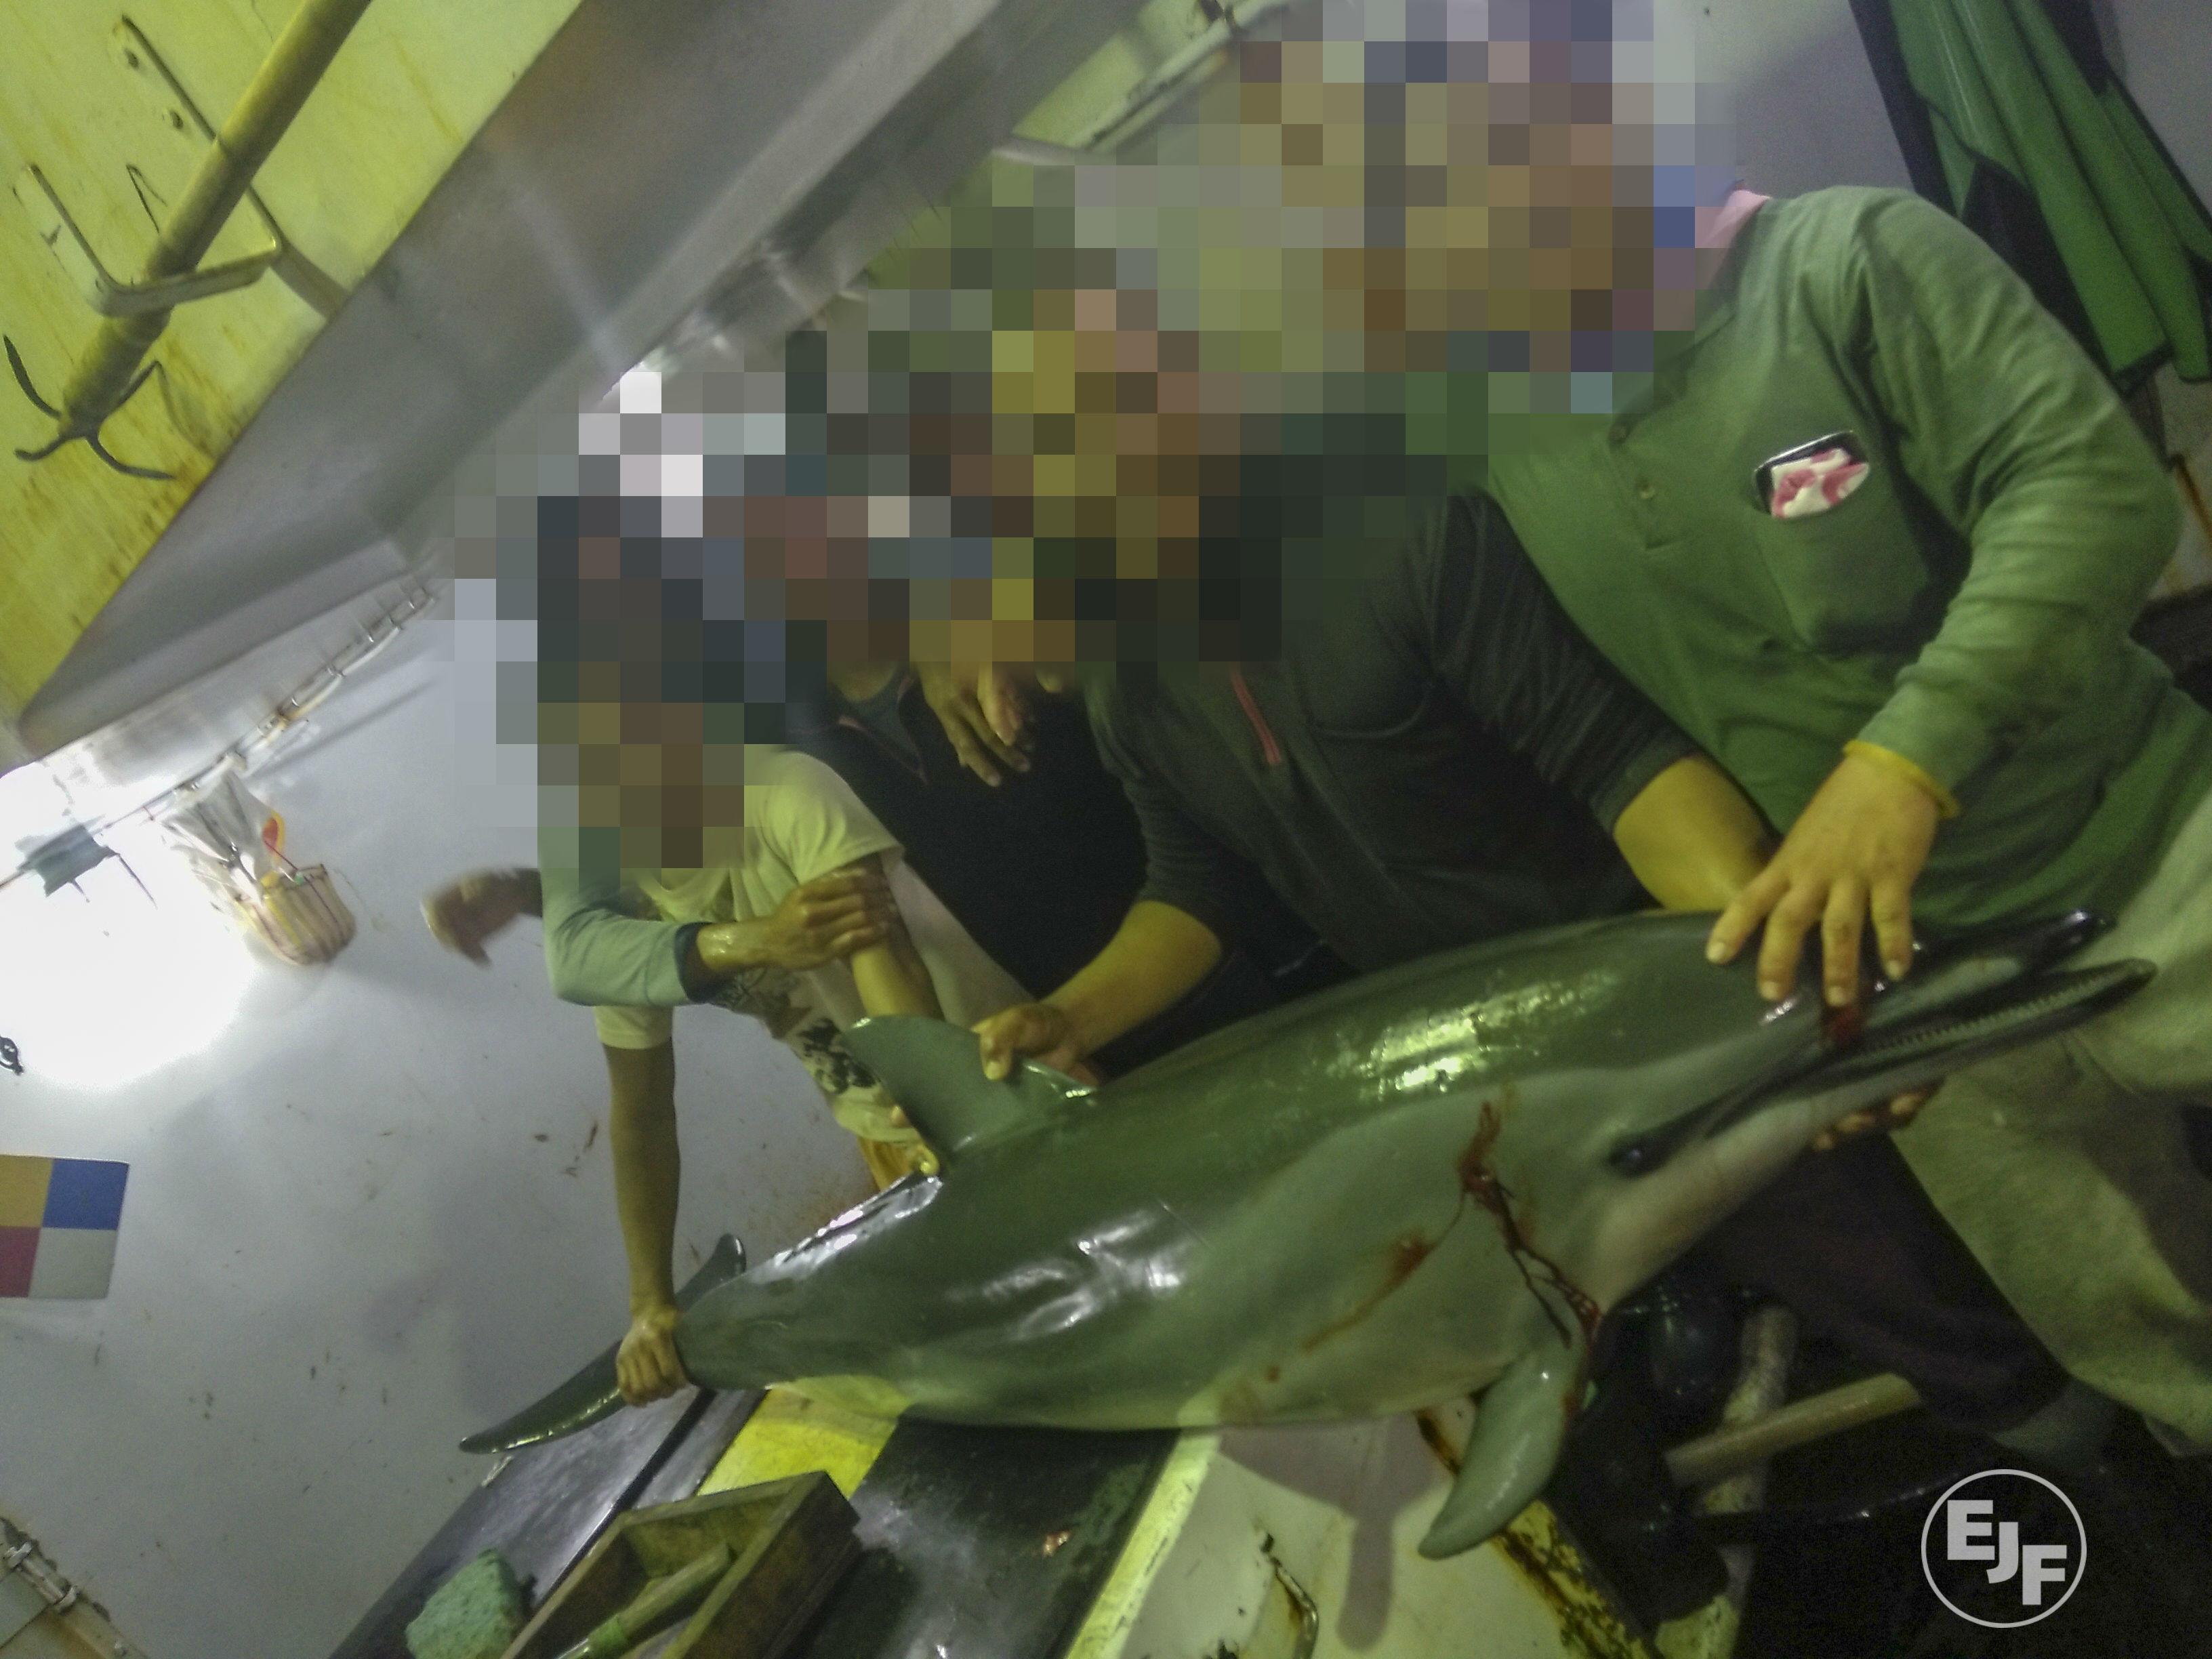 EJF 再揭台灣漁船非法割鰭棄身、捕殺海豚及海龜,引起國際社會關注